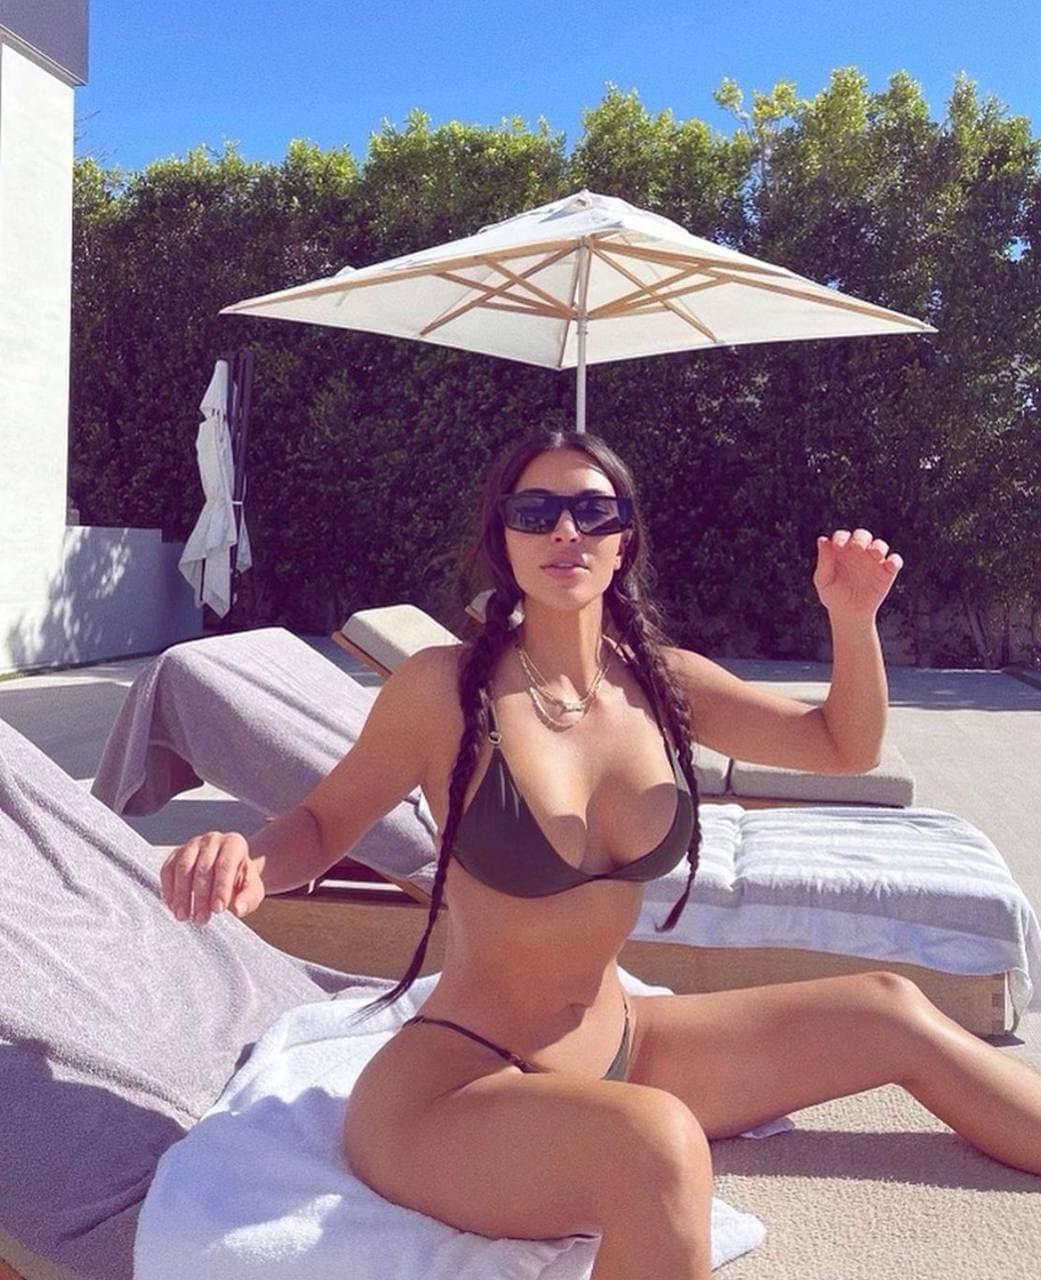 Ким Кардашьян (Фото: @kimkardashian)